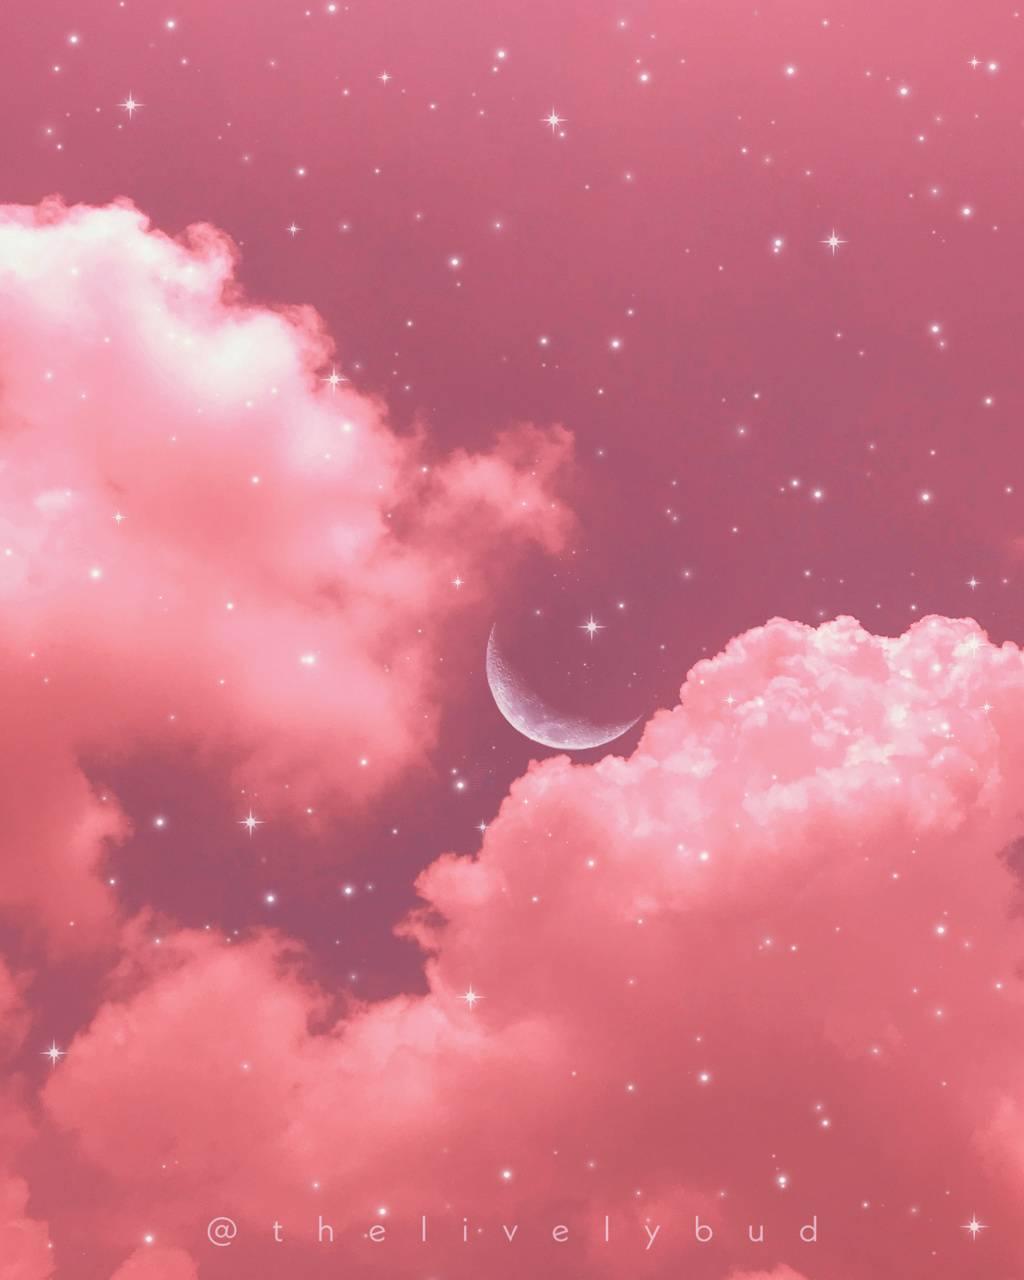 Aesthetic sky 9